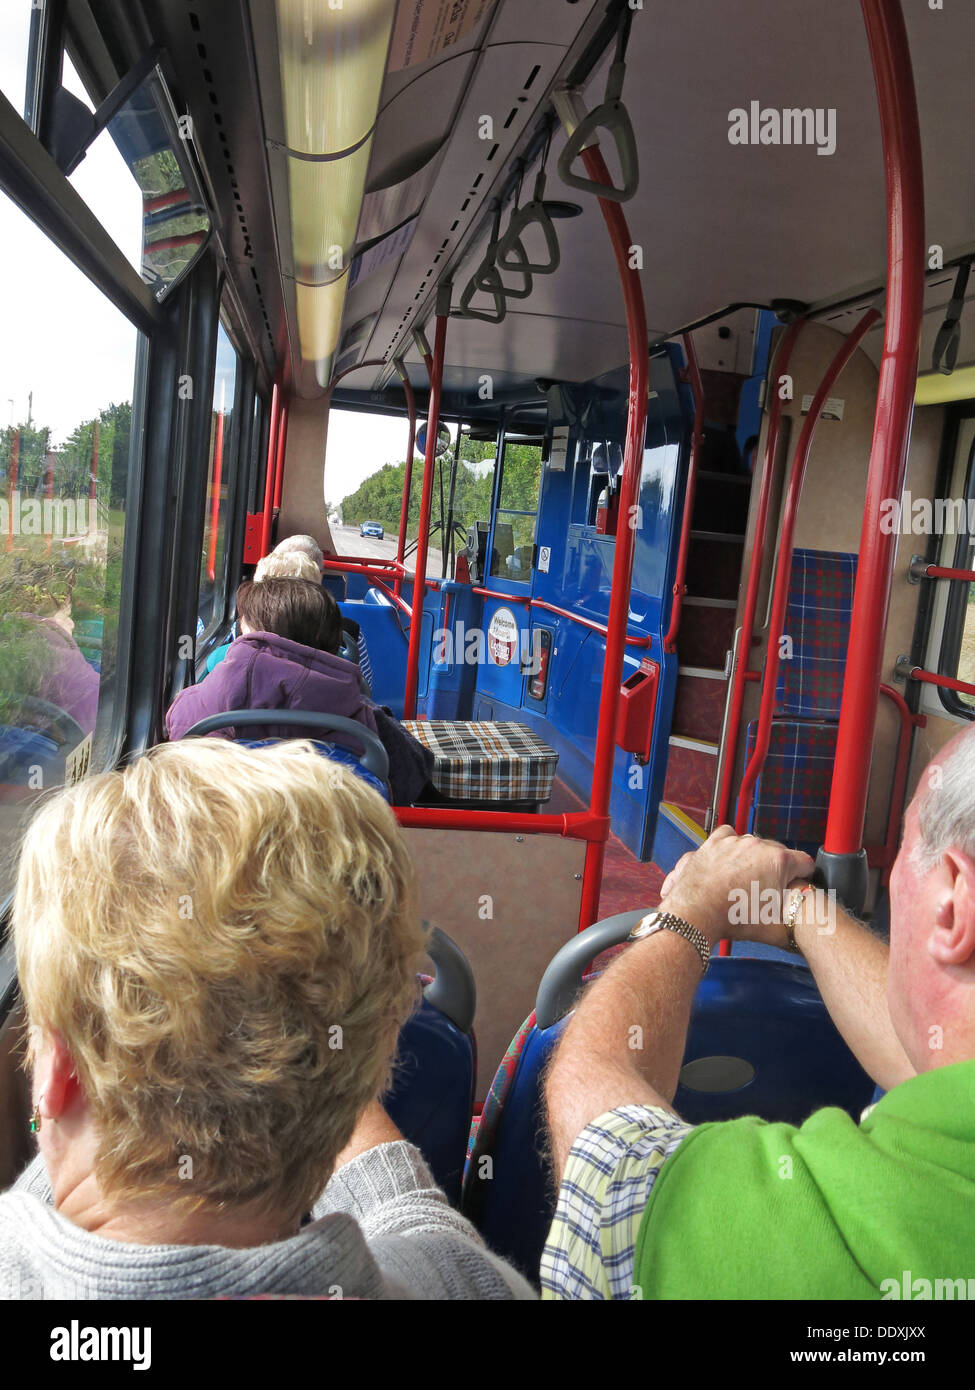 Laden Sie dieses Alamy Stockfoto Passagiere auf einem Edinburgh, Lothian Transportbus. - DDXJXX